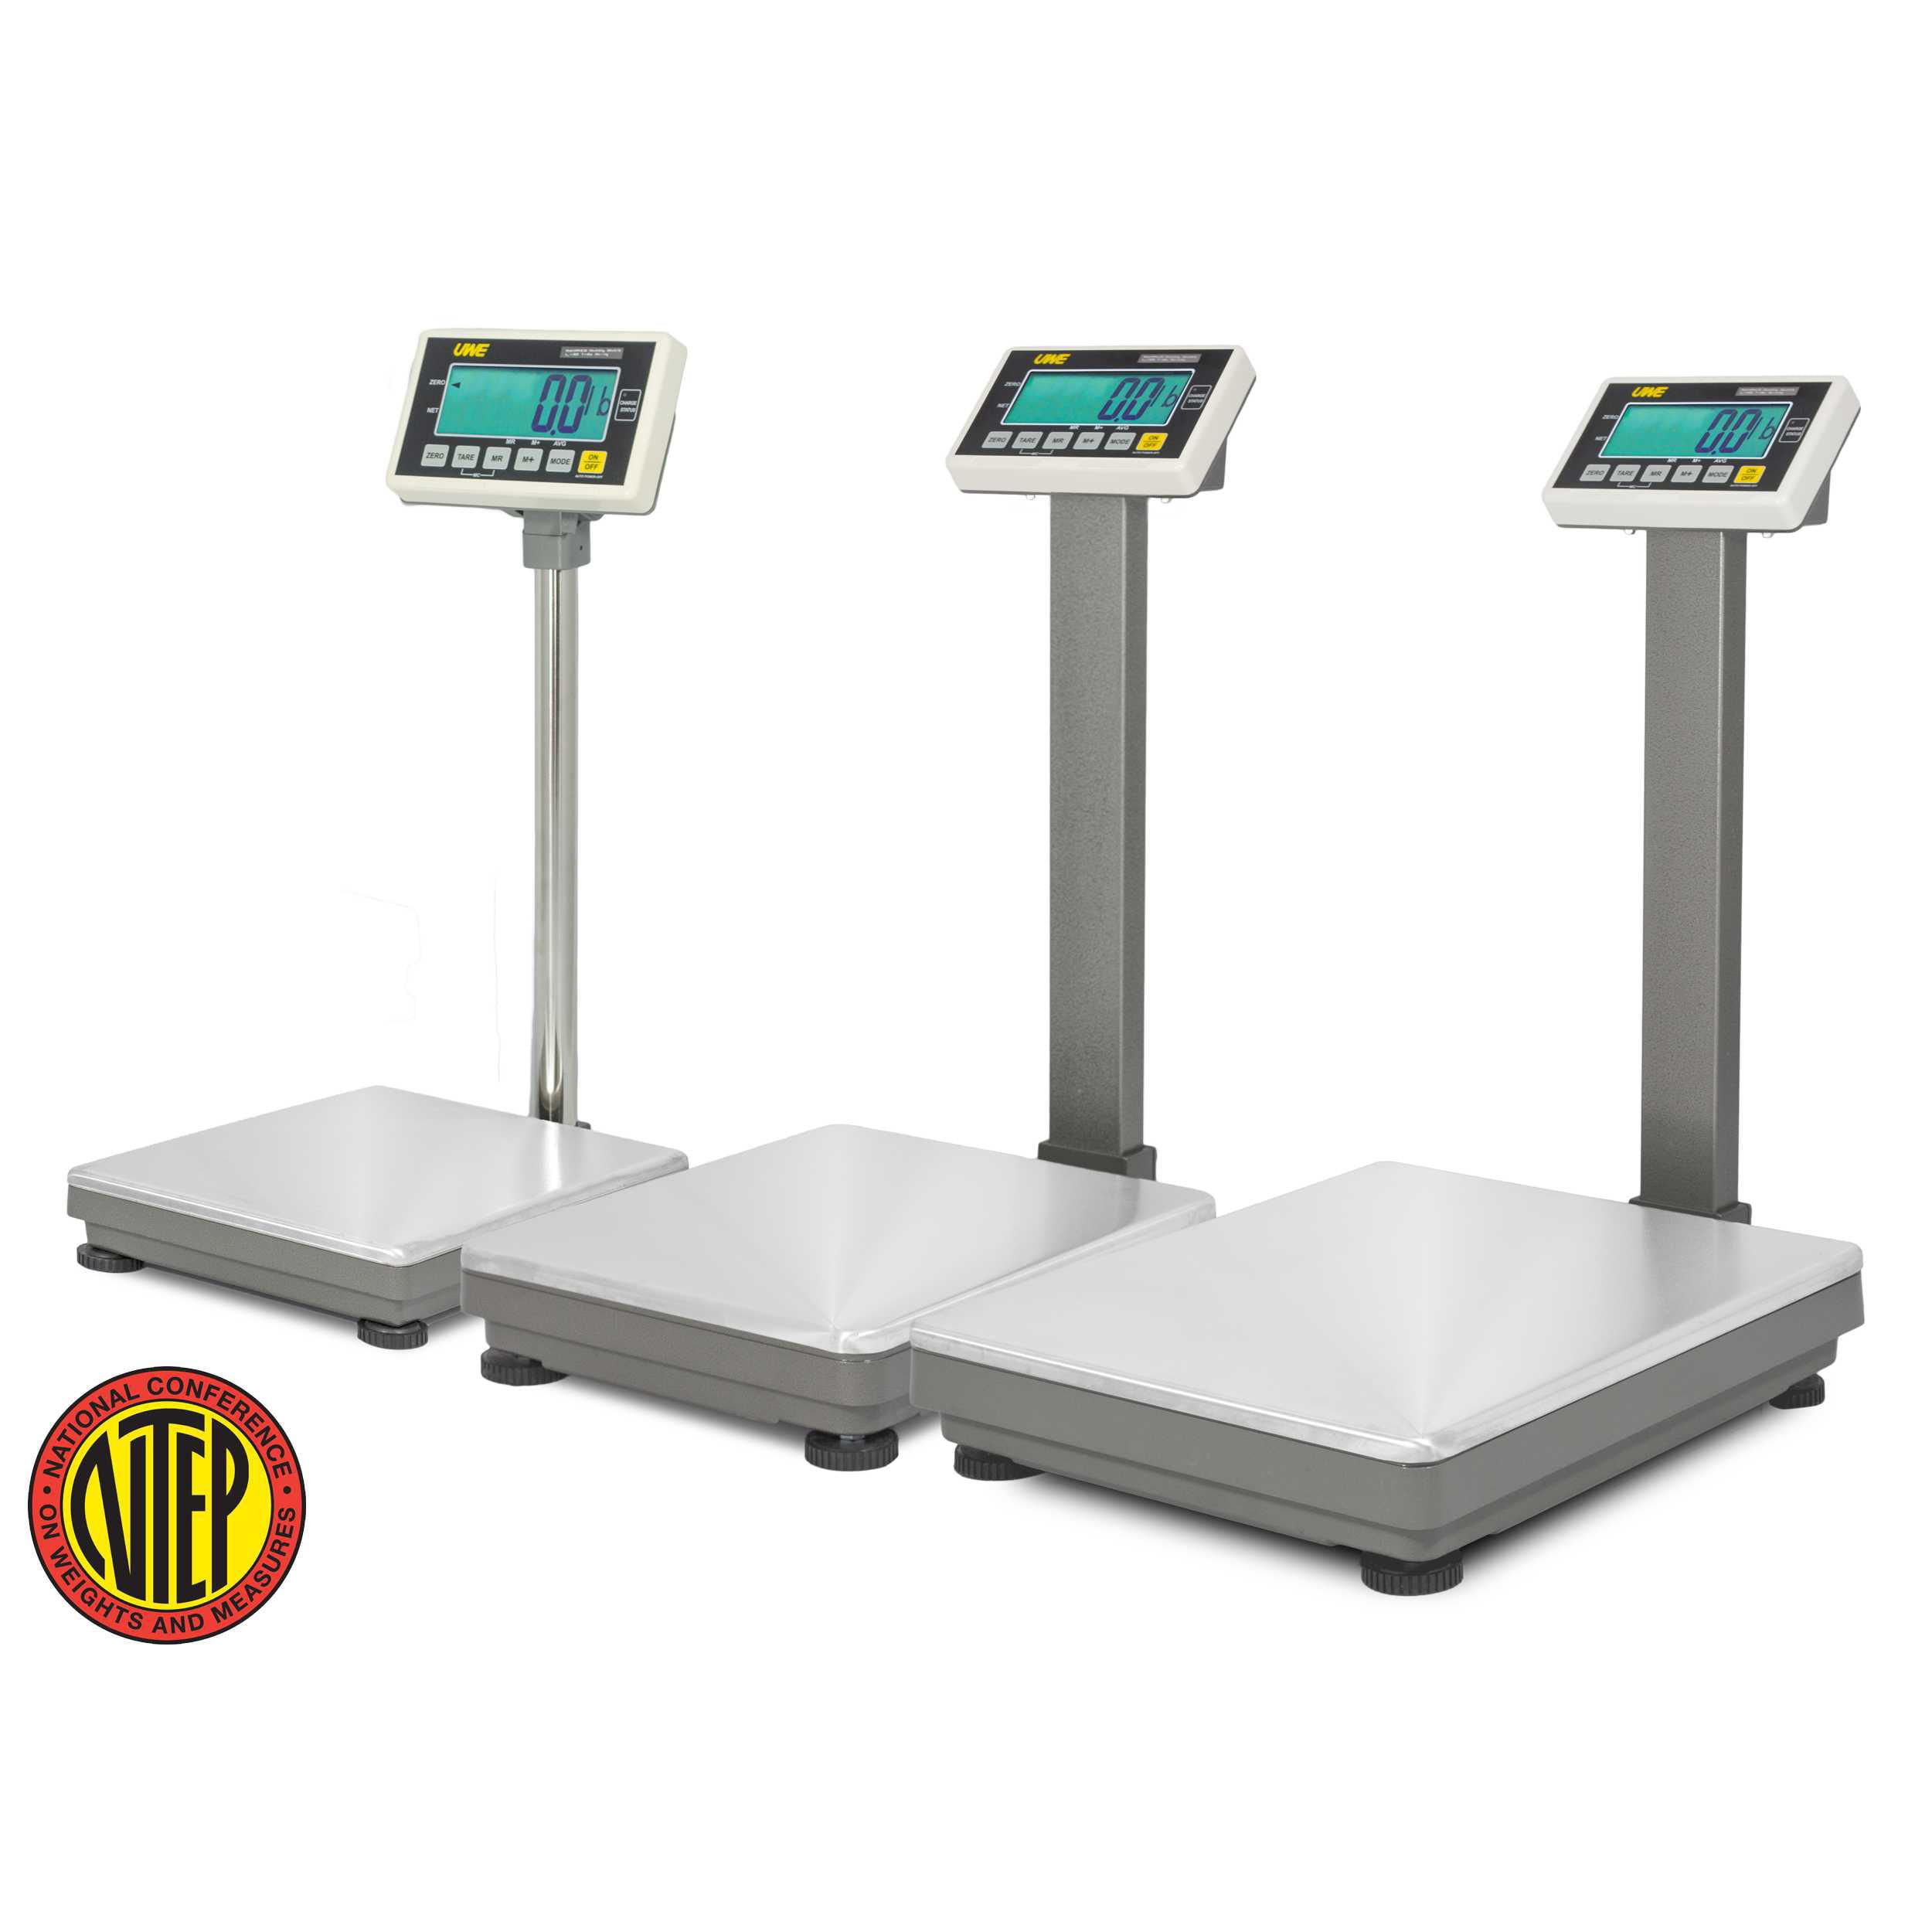 UWE, UFM-B150, Industrial Bench Scale, 300 lb x 0.1 lb, NTEP, Class III